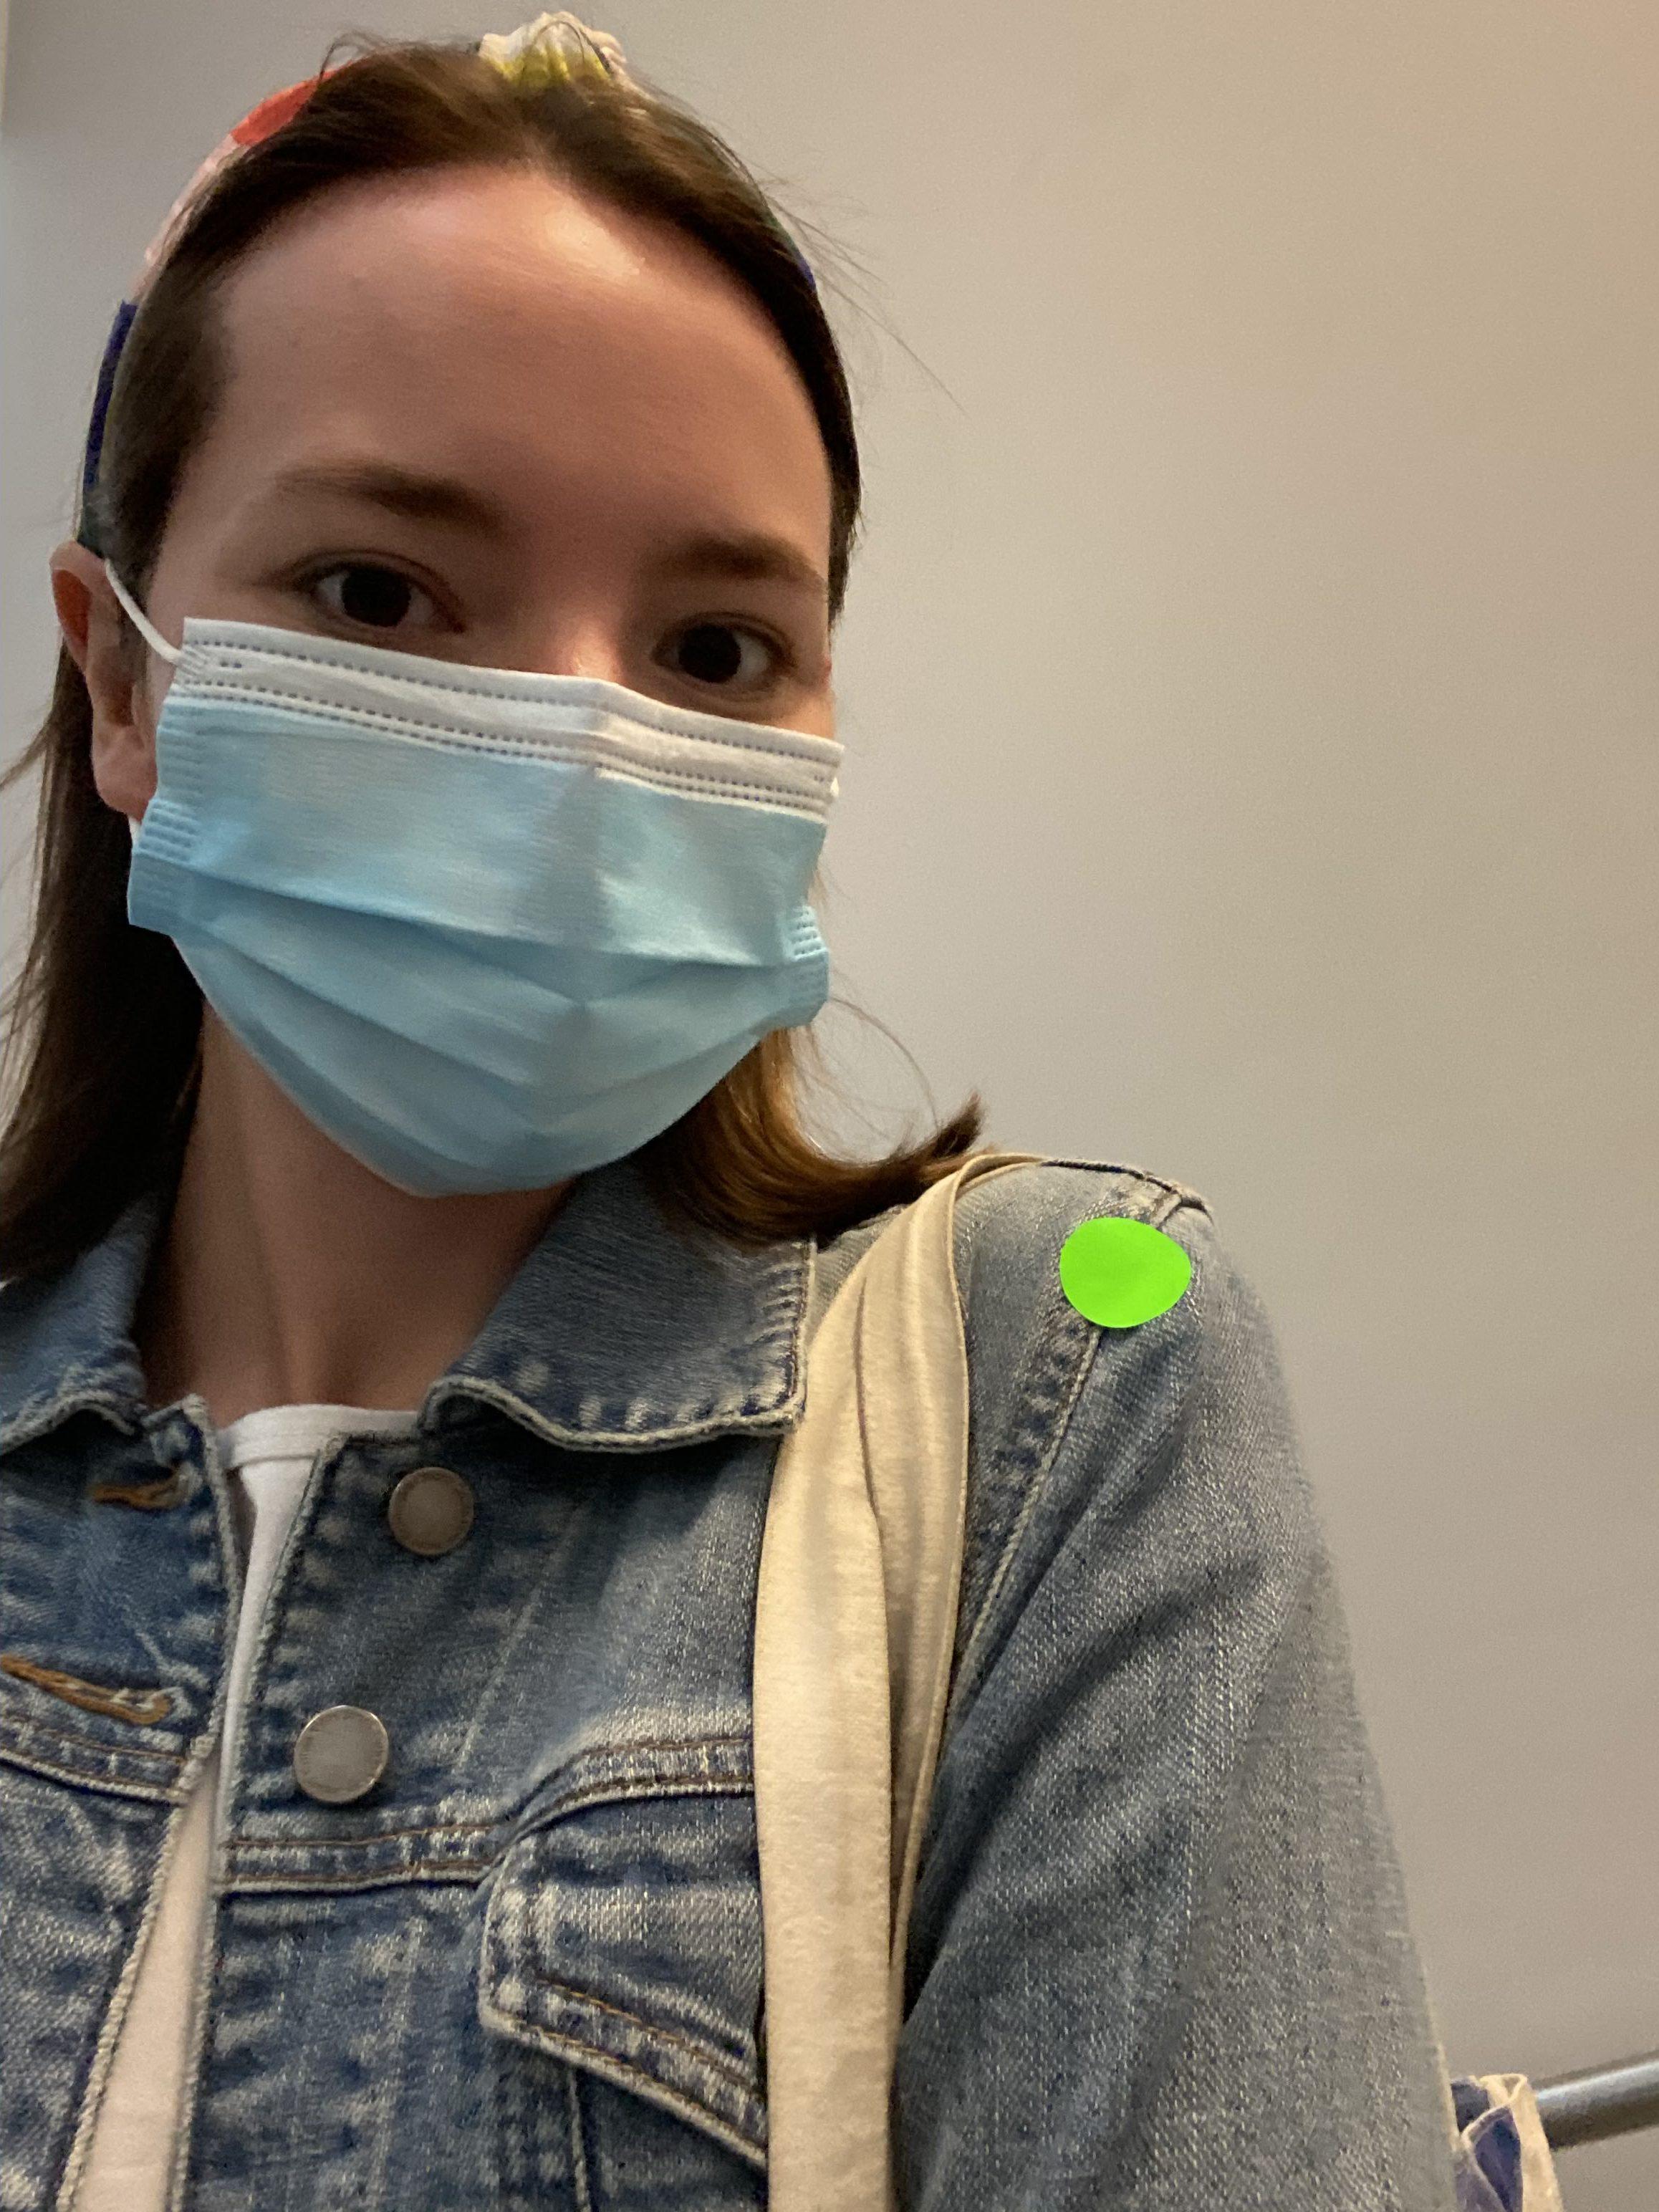 Getting My COVID-19 Vaccine